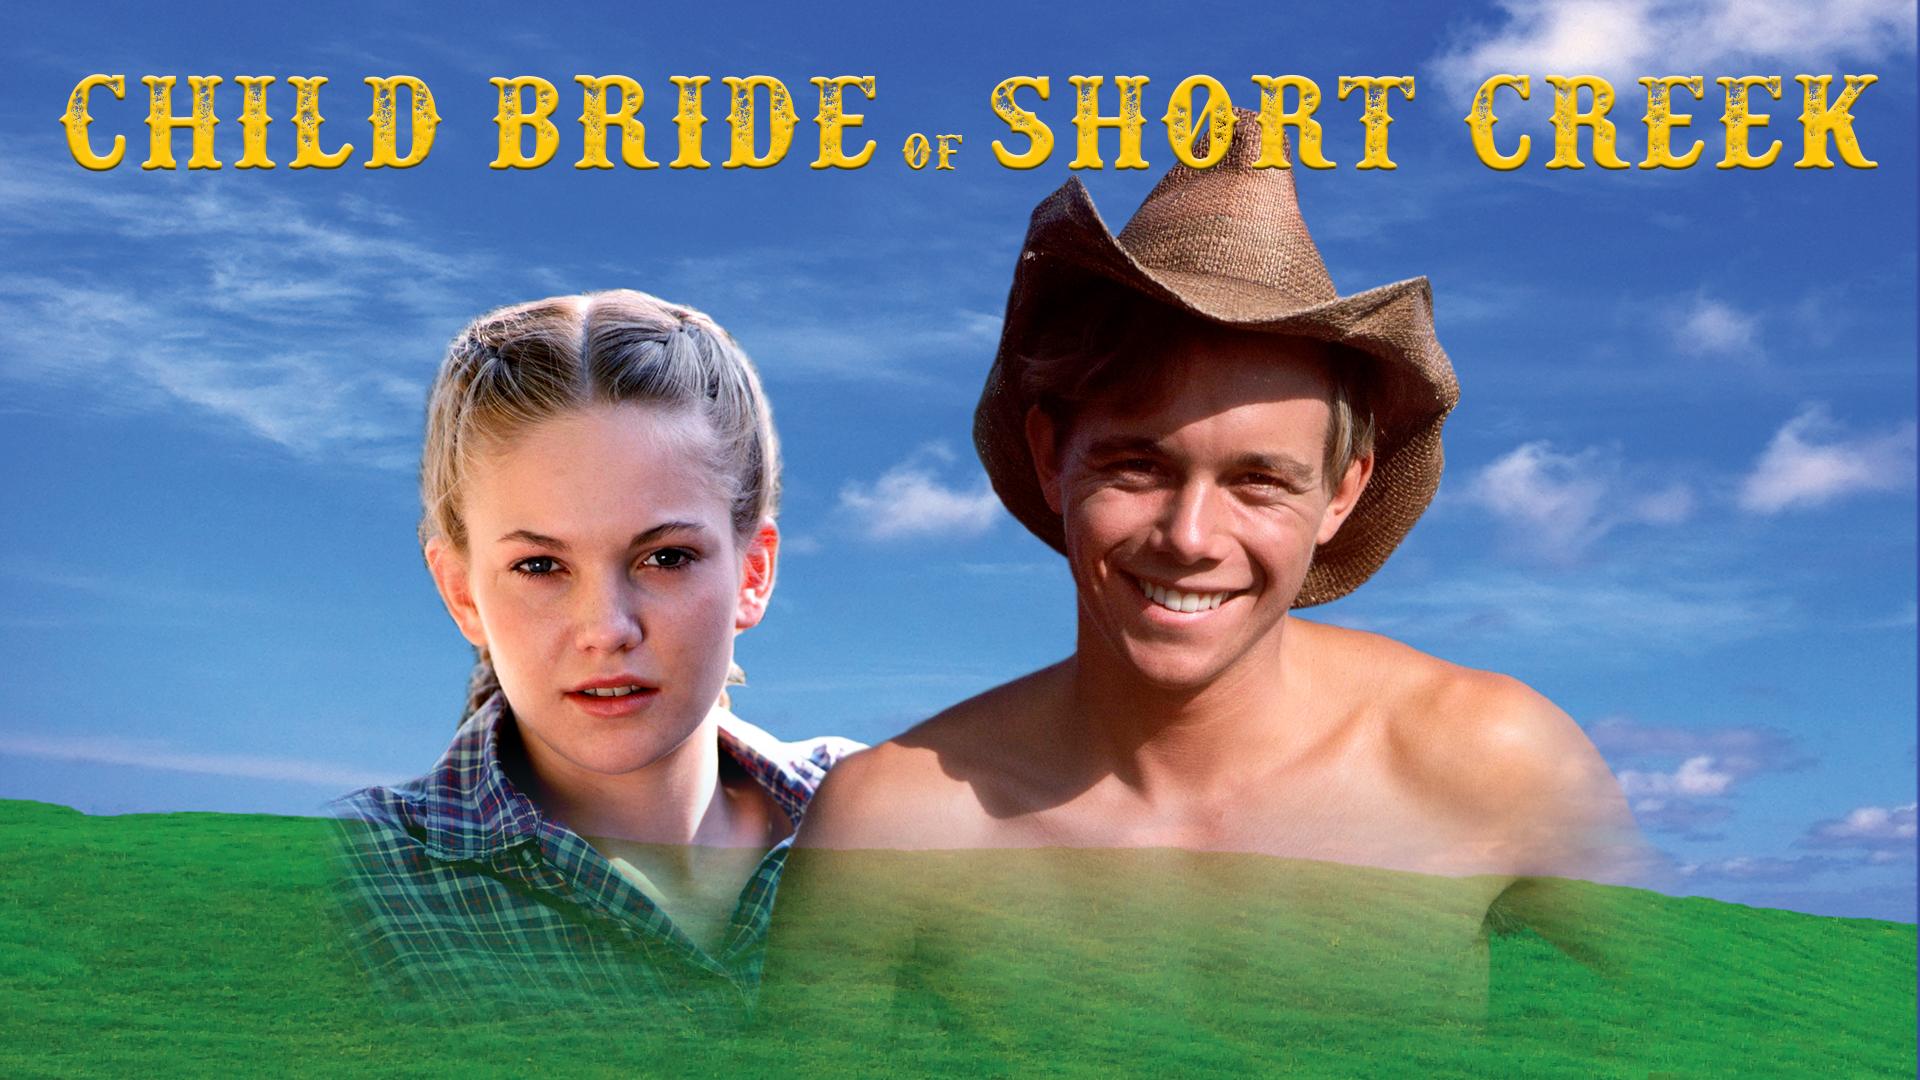 The Child Bride Of Short Creek